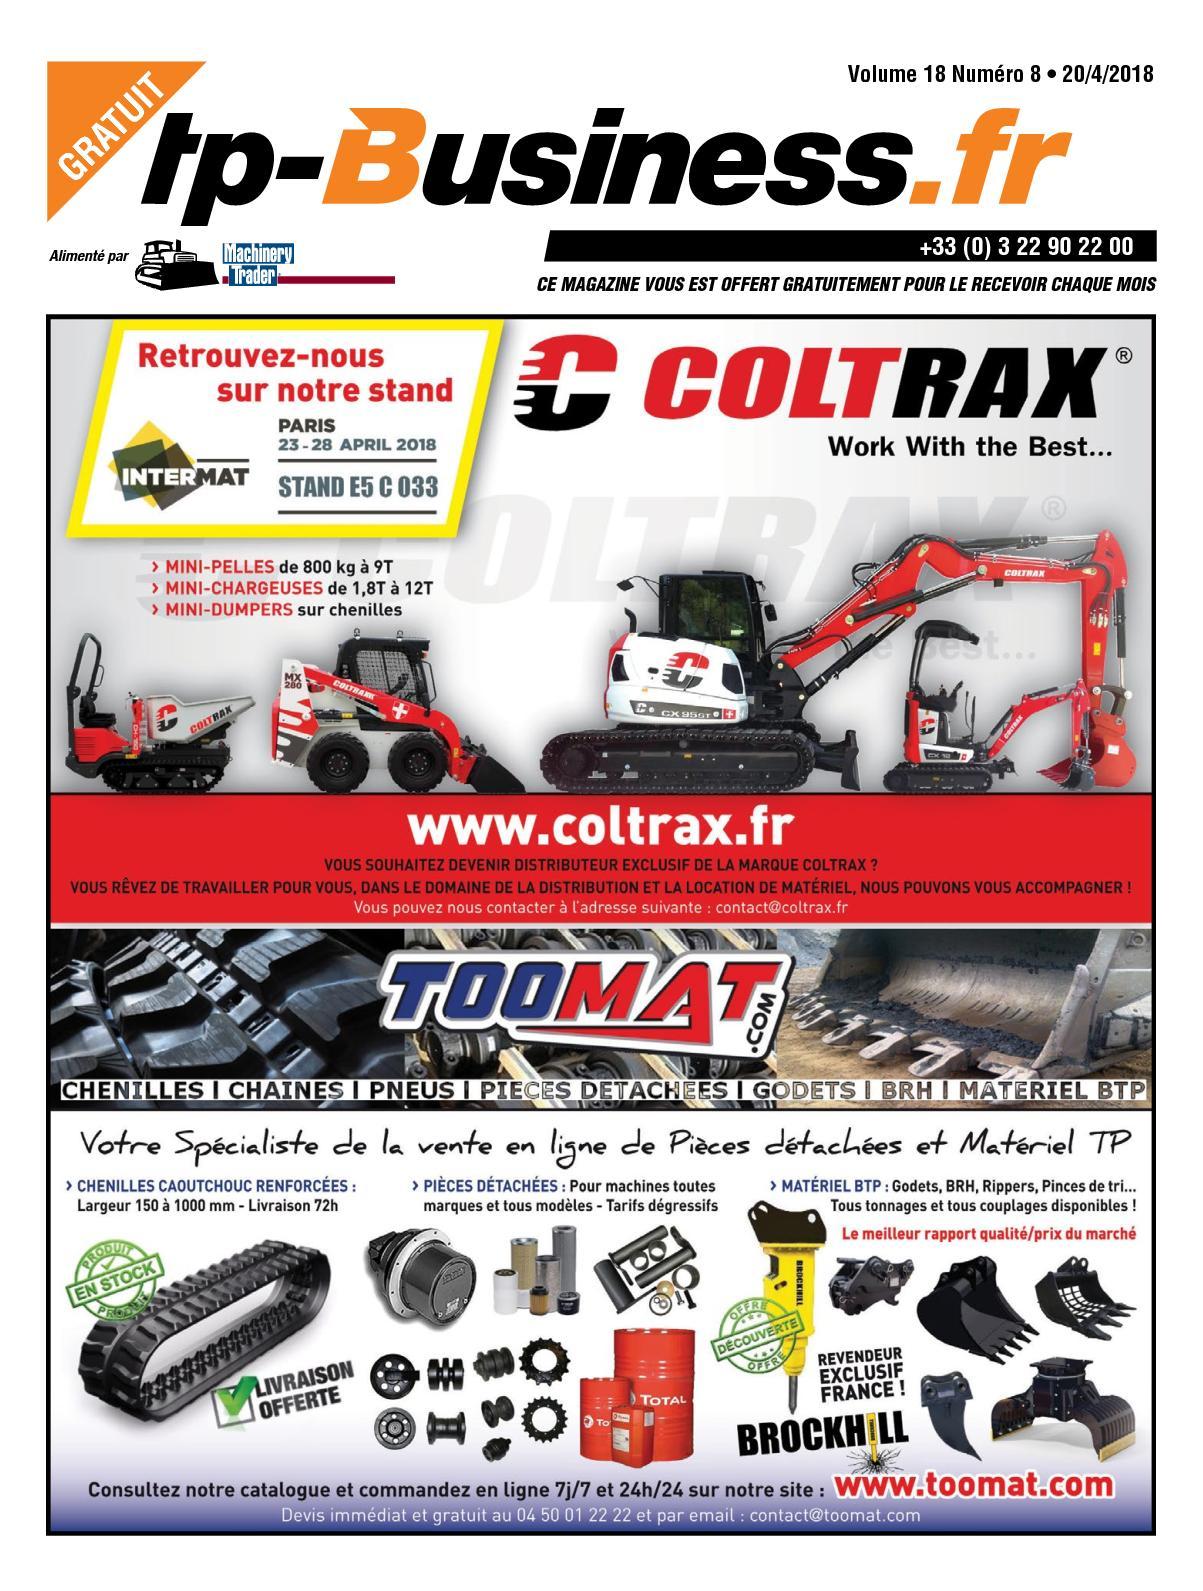 Calamo tp business volume 18 numro 08 20042108 fandeluxe Image collections